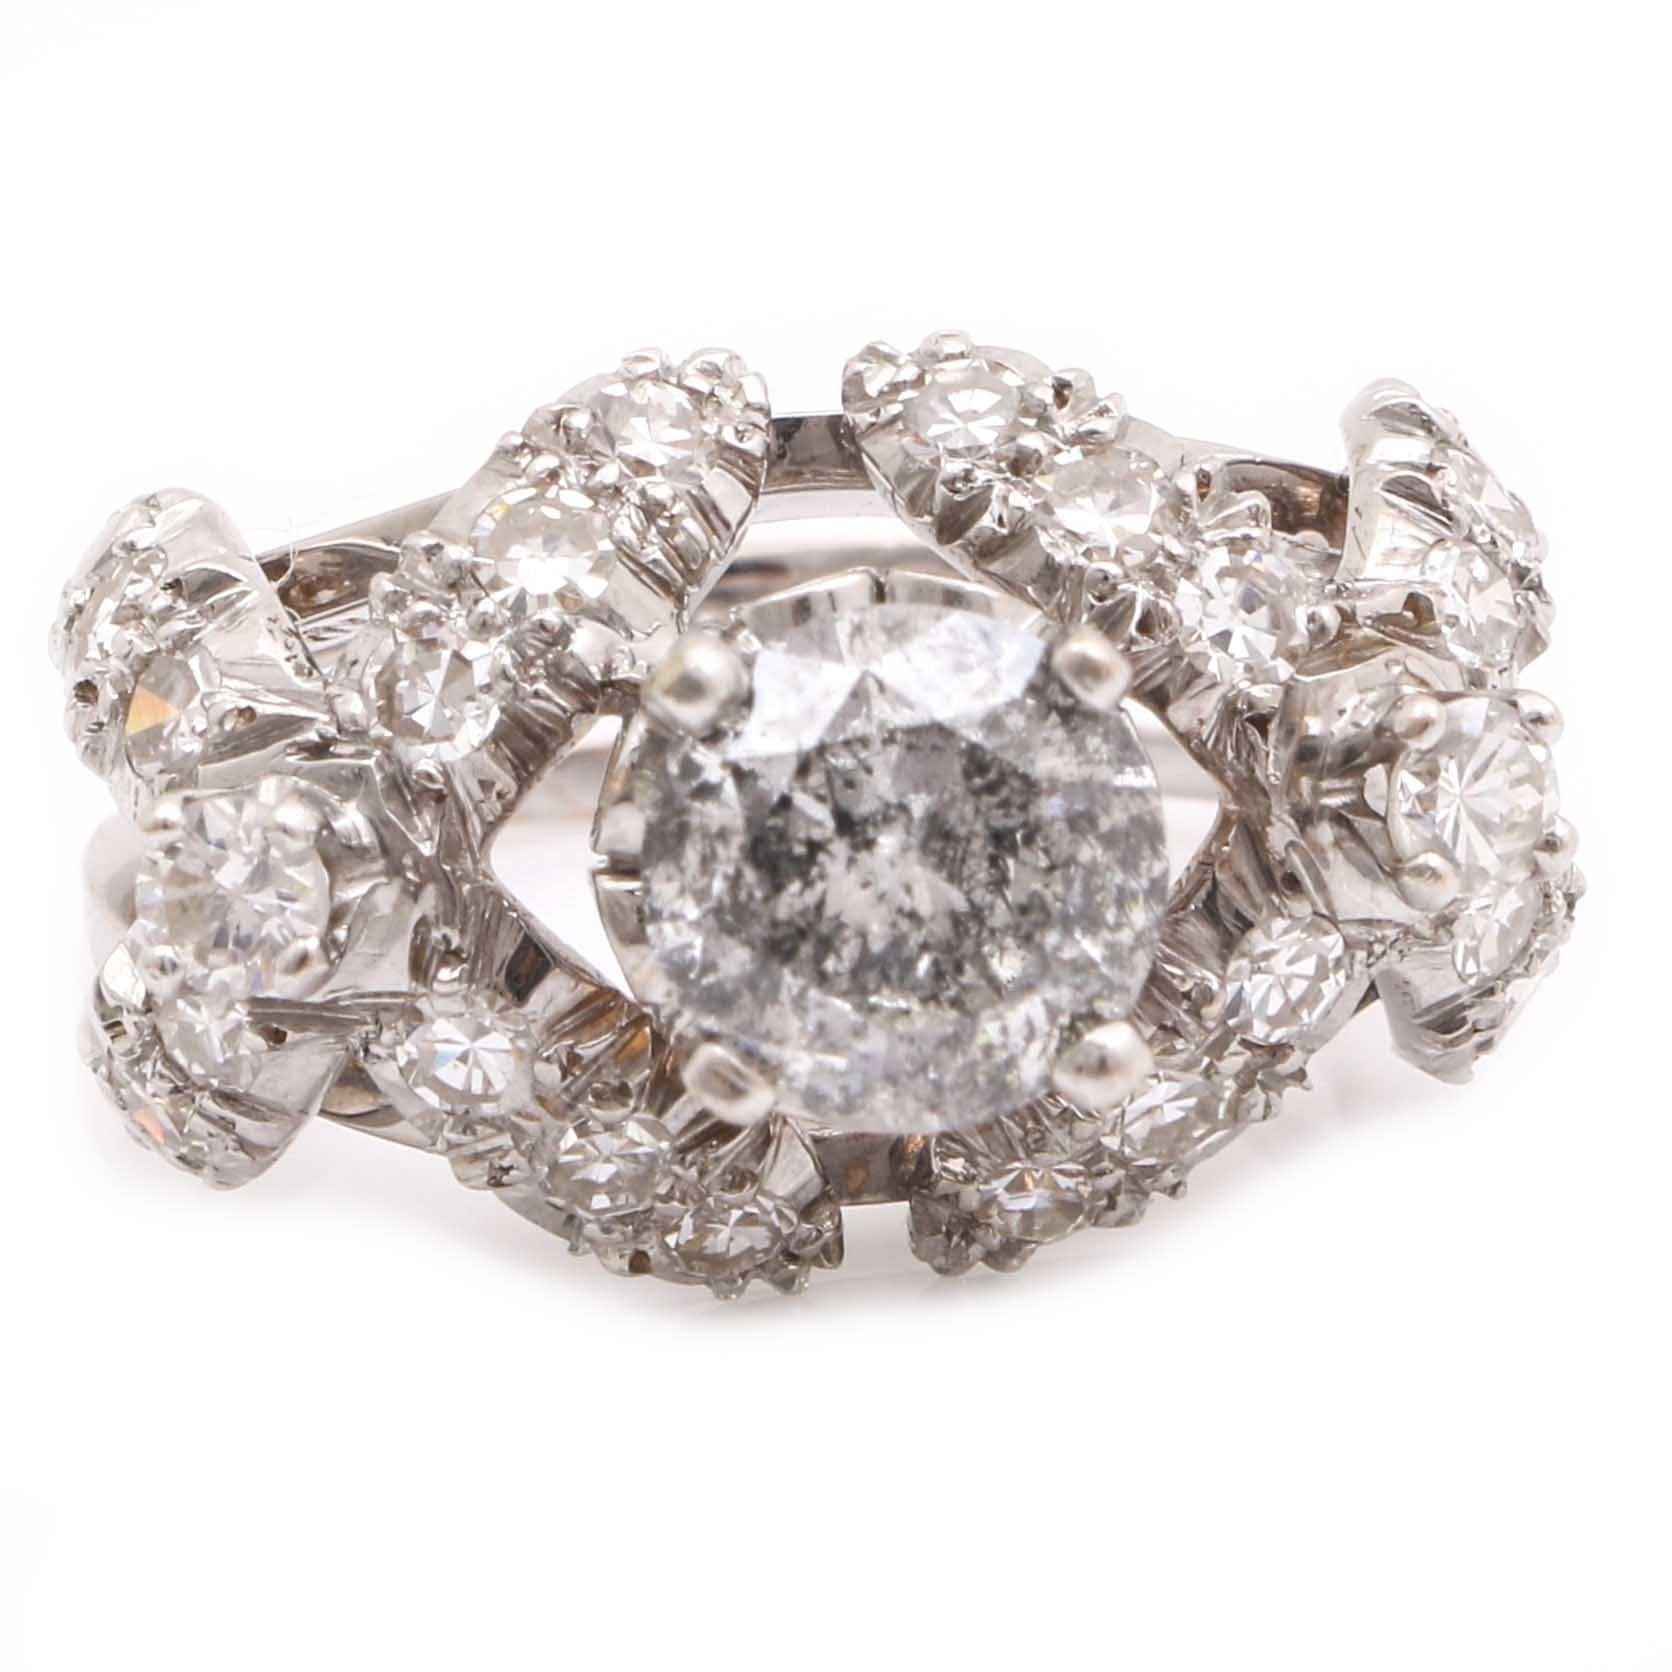 18K White Gold 2.35 CTW Diamond Ring